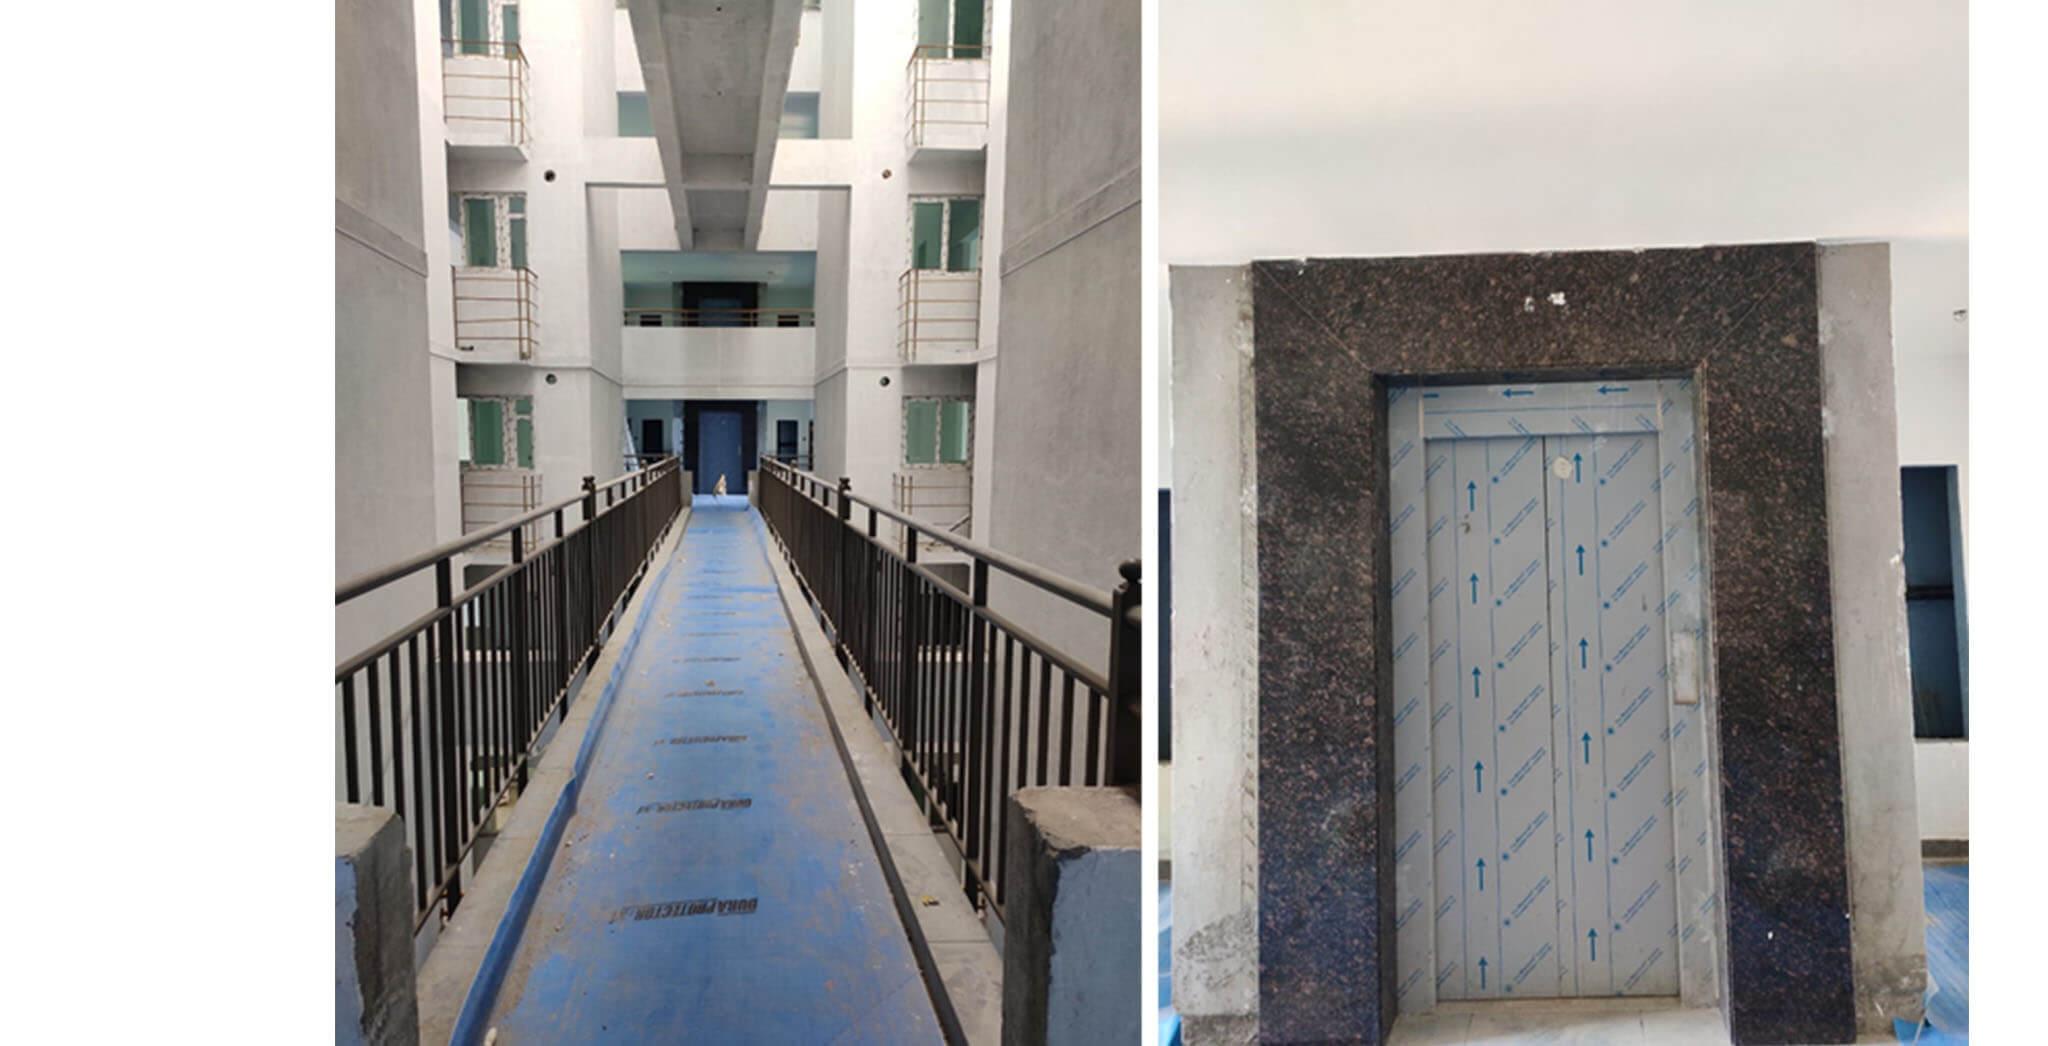 May 2021 - Connecting bridge—tiling work & lift cladding